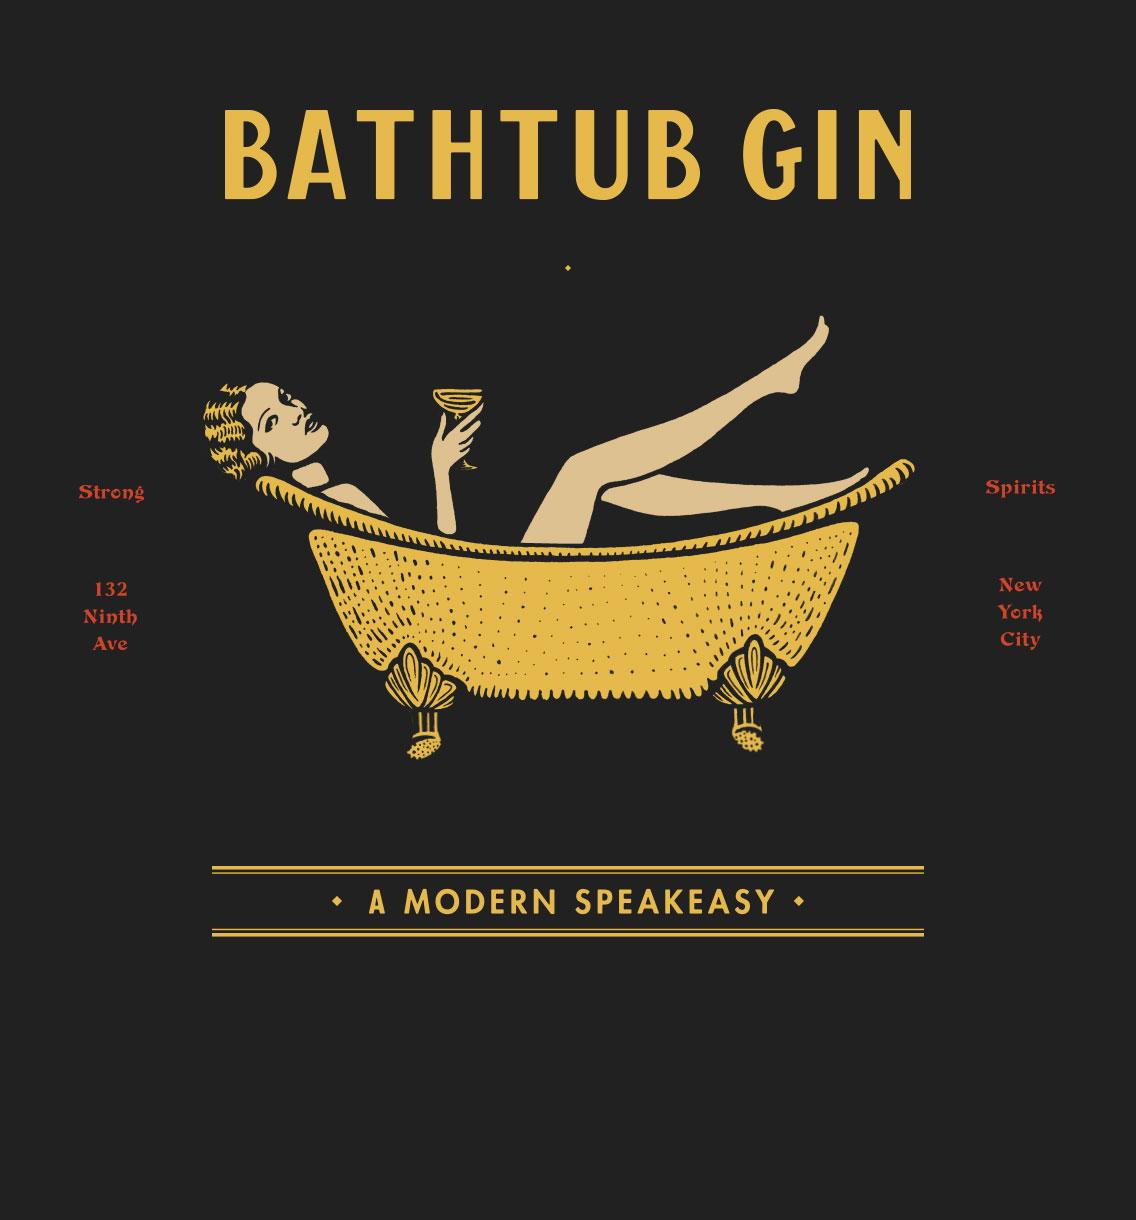 bathtub gin branding